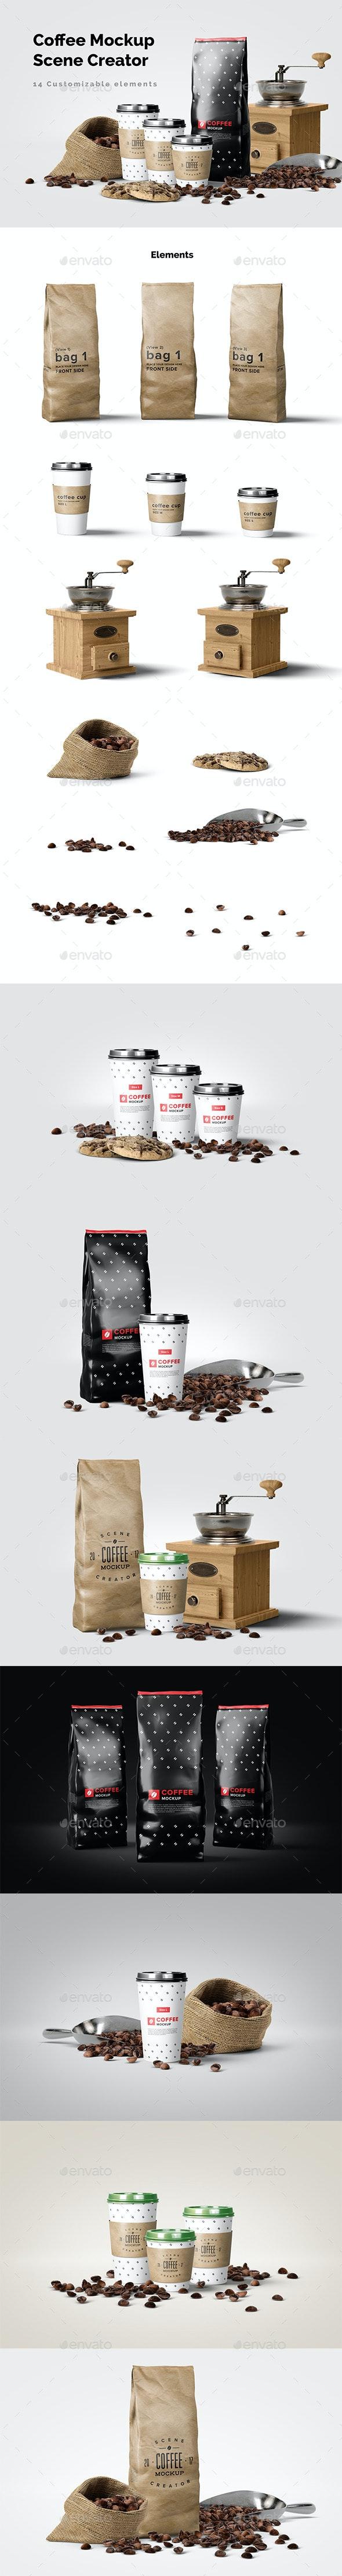 Coffee Mockup Scene Creator - Food and Drink Packaging